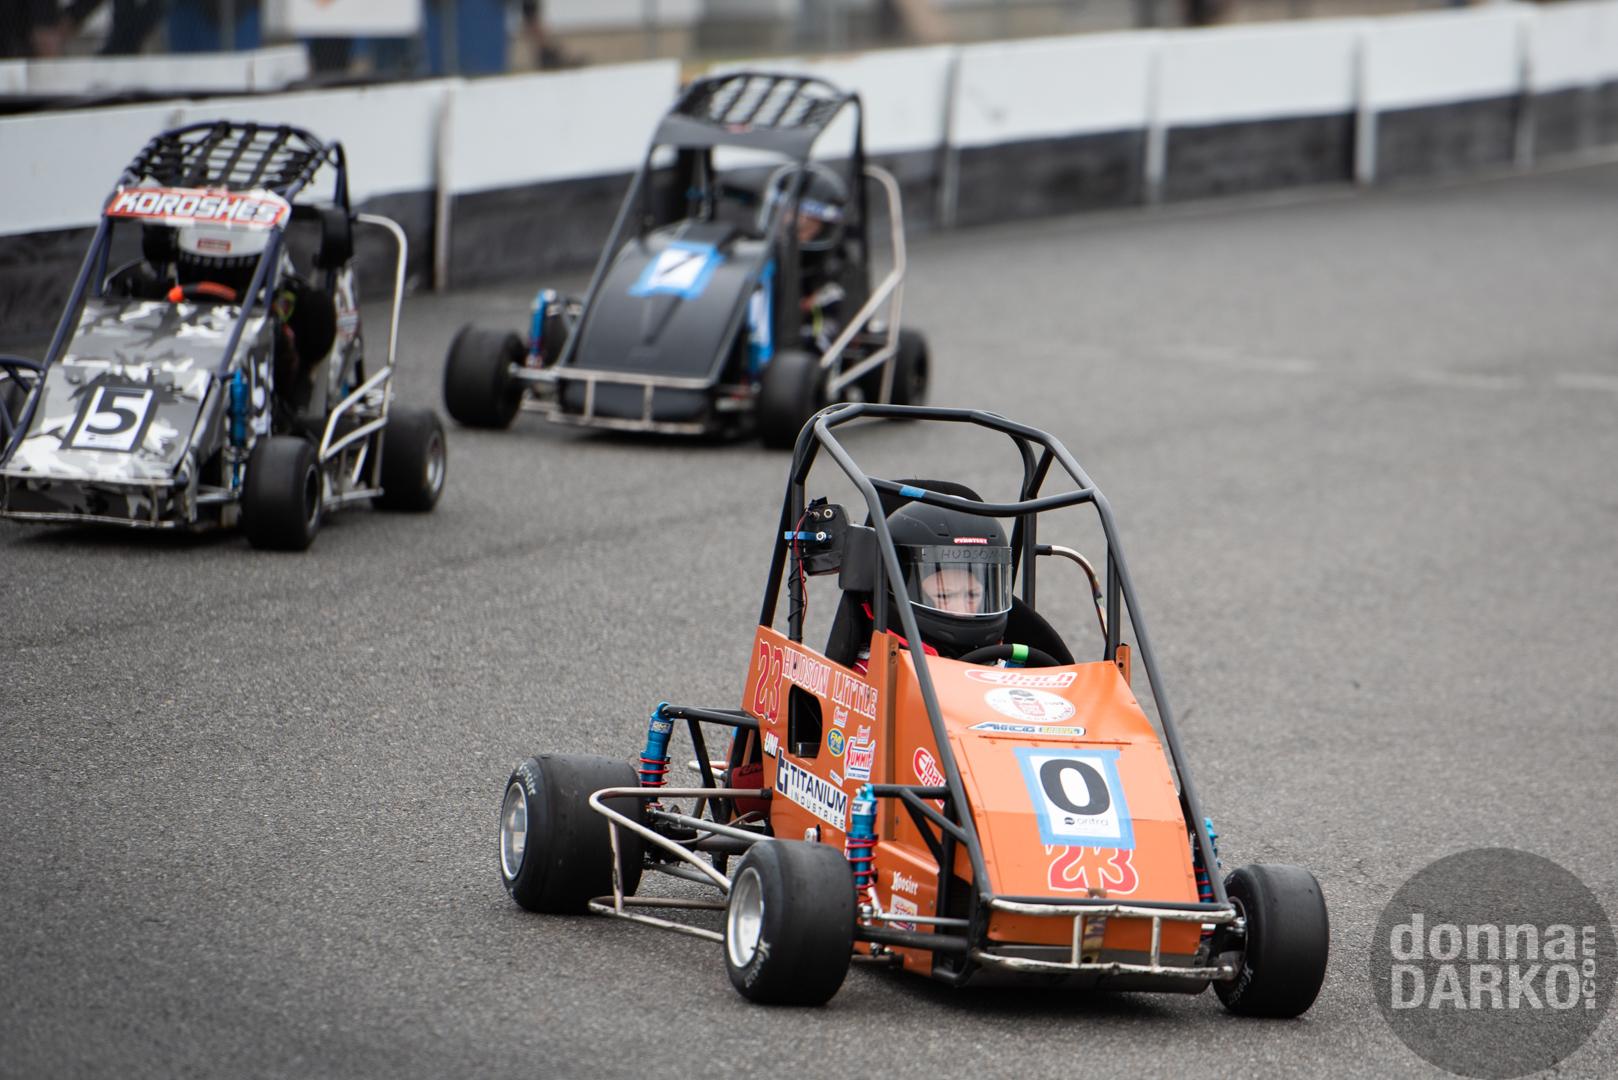 QWMA (Racing) 8-11-2019 DSC_5945.jpg